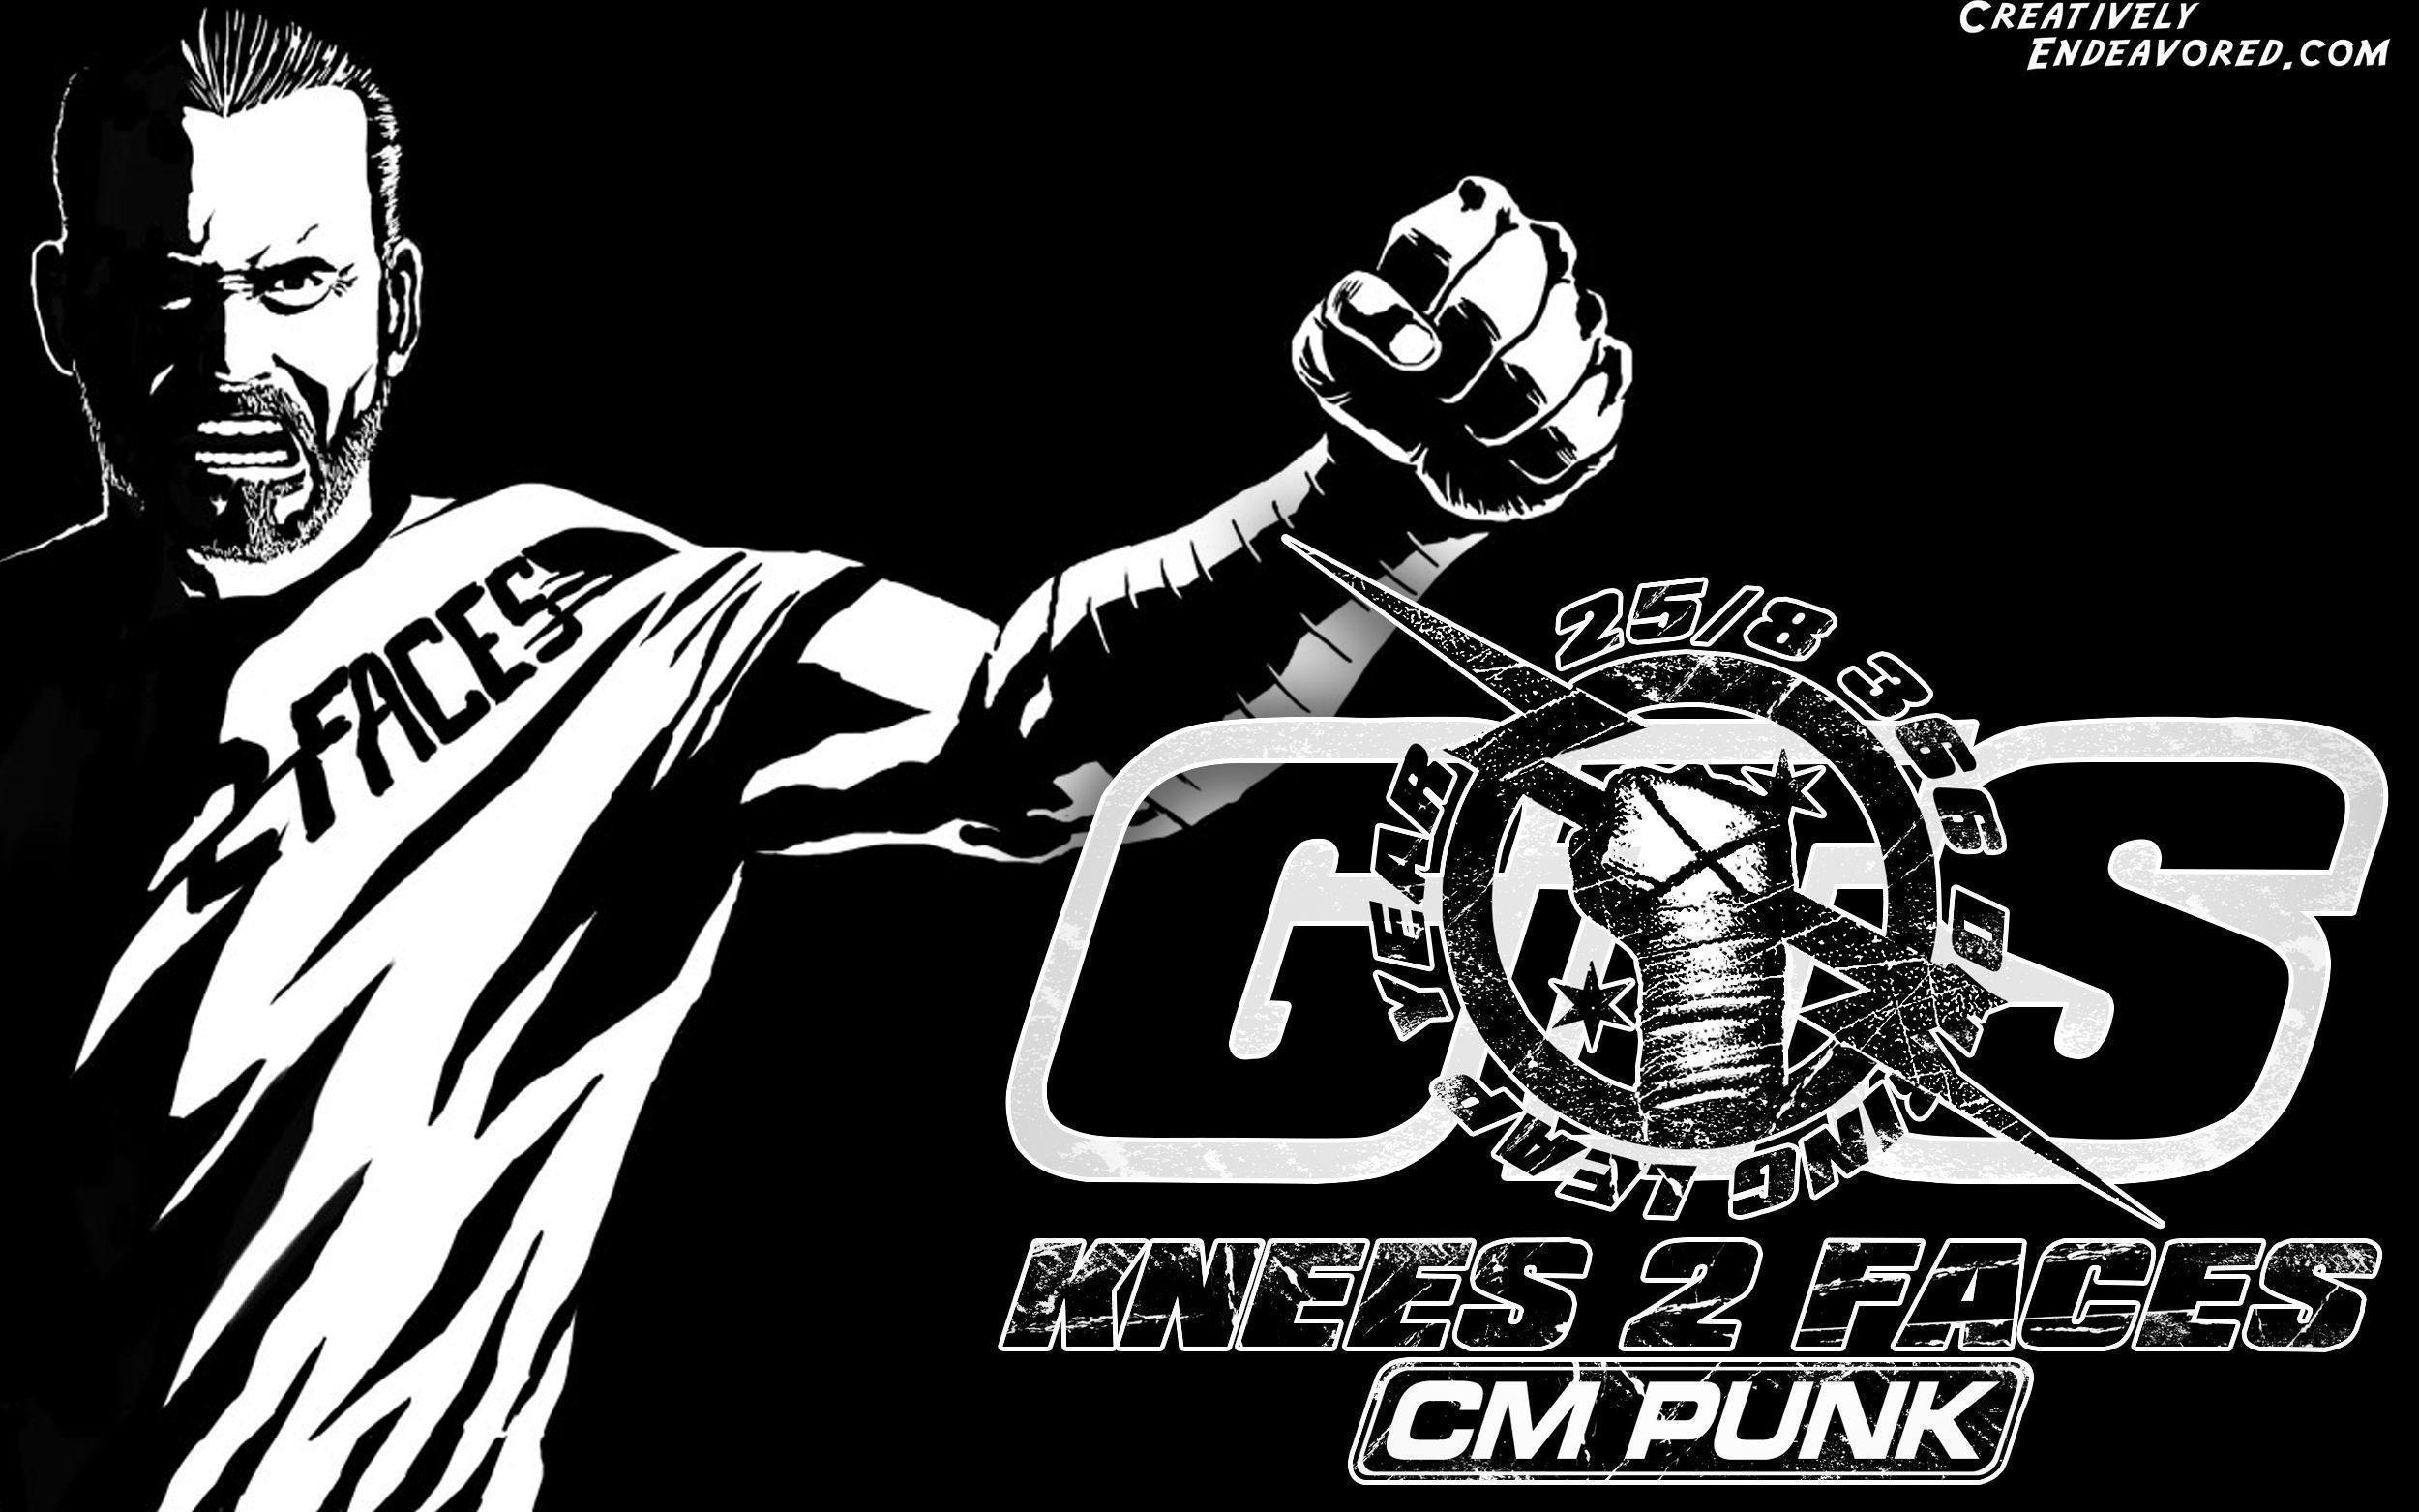 cm punk logo wallpapers 2015 wallpaper cave